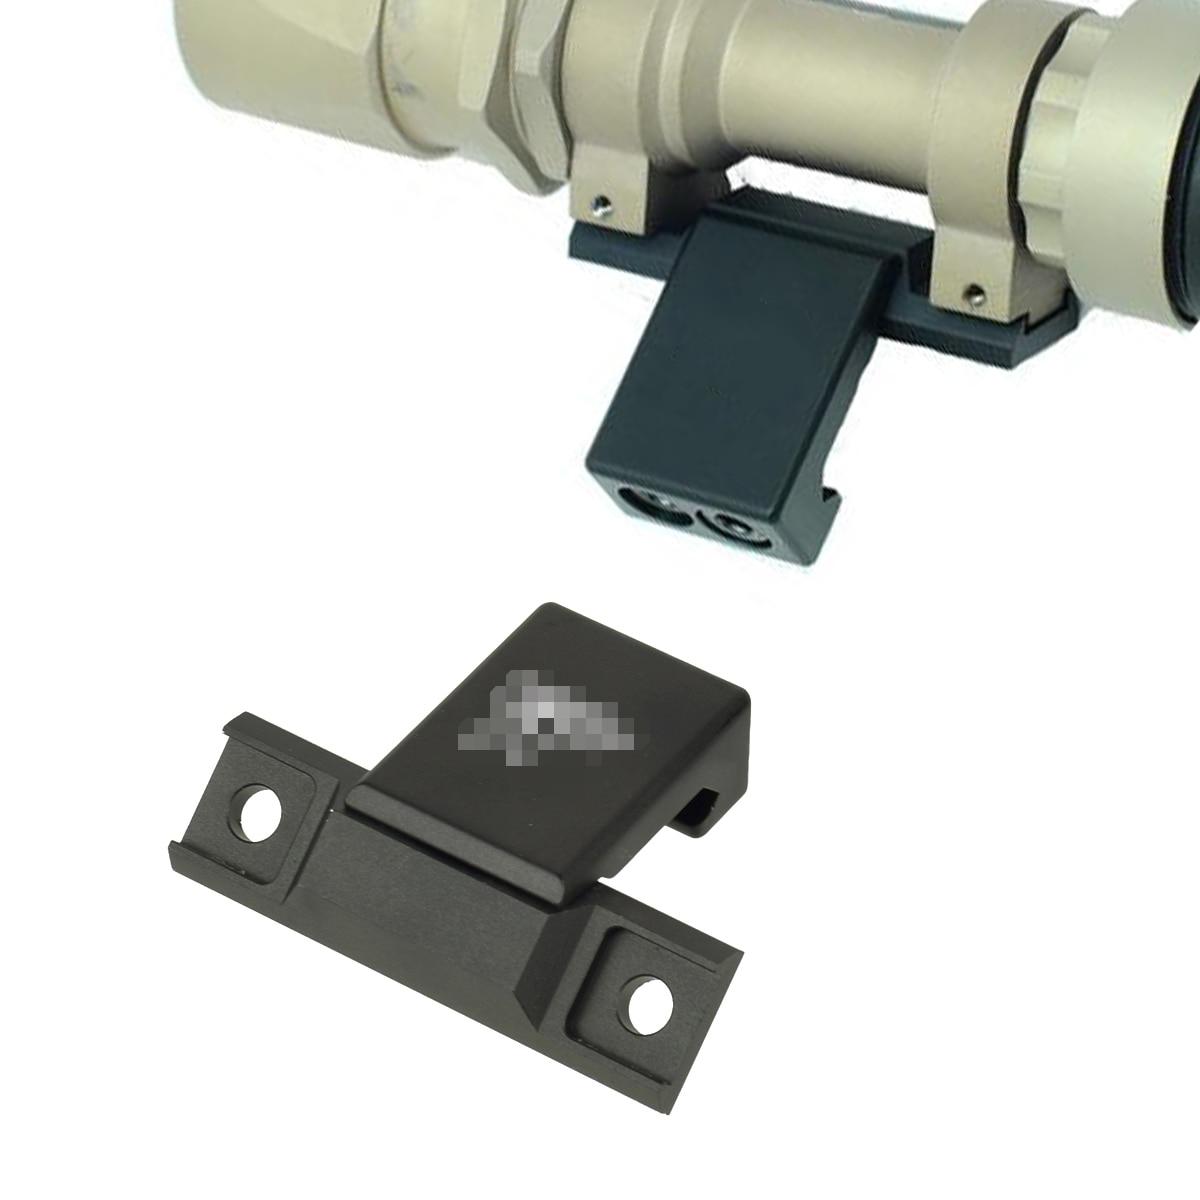 Weapon Light Offset Mount For Surefir M951 M620V Series Mounted On Picatinny Weaver Rail